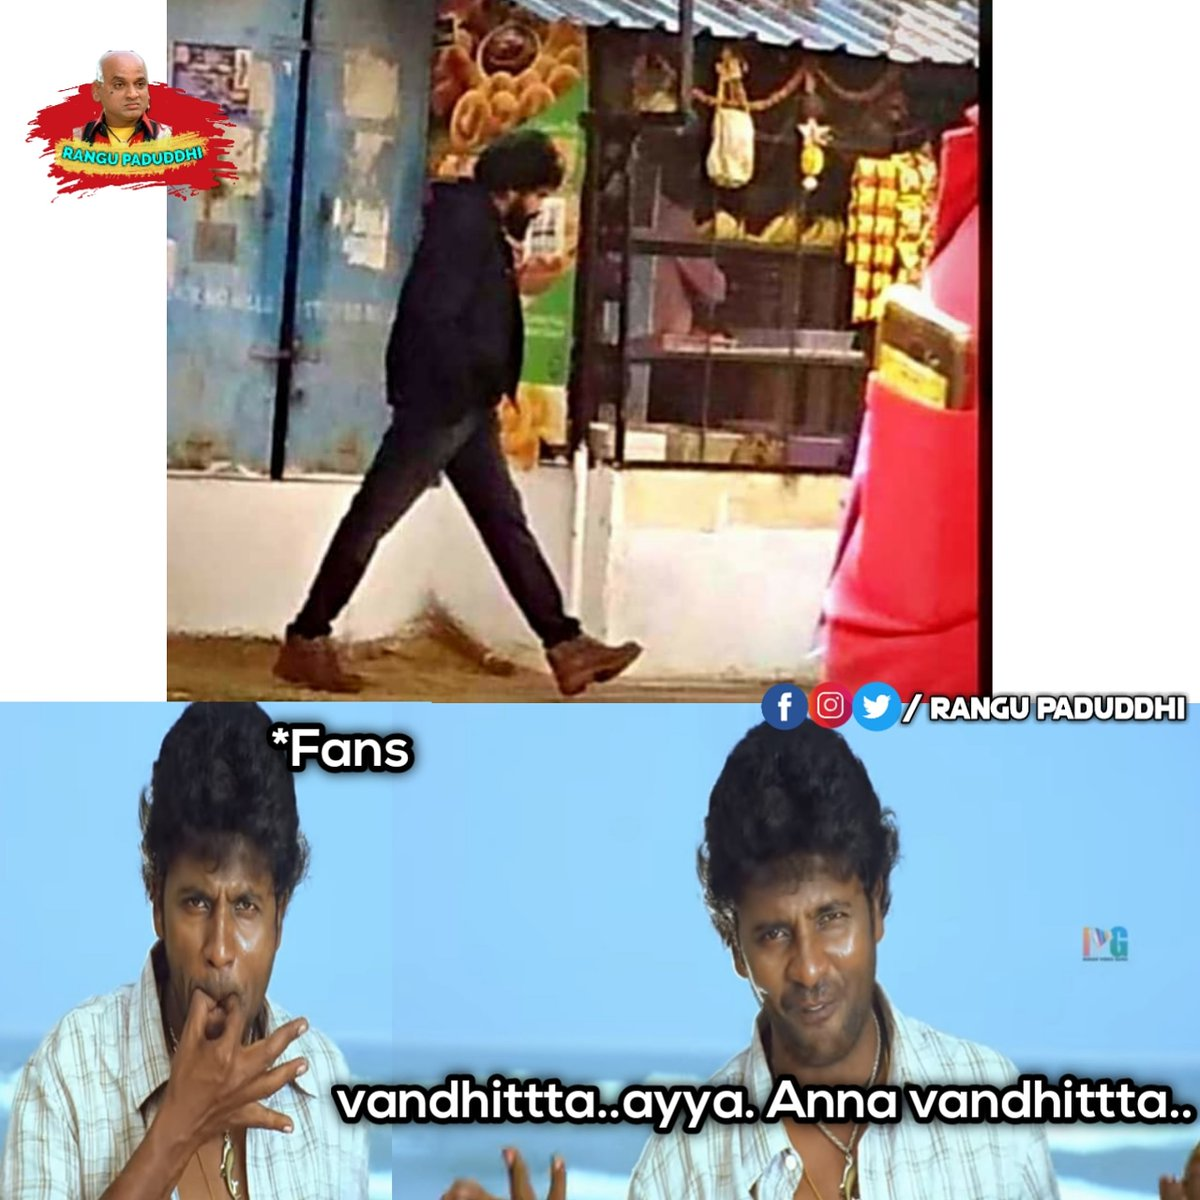 For more fun Do follow - @rangu_paduddhi #rangupaduddhi #comedy #fun #memes #memesdaily #telugumemes #trolls #telugumeme #telugucomedy #alavaikunthapurramuloo #meme #memes@PawanKalyan #Pk #Pink #Pawanakalyanpic.twitter.com/KTWvrgYKtc